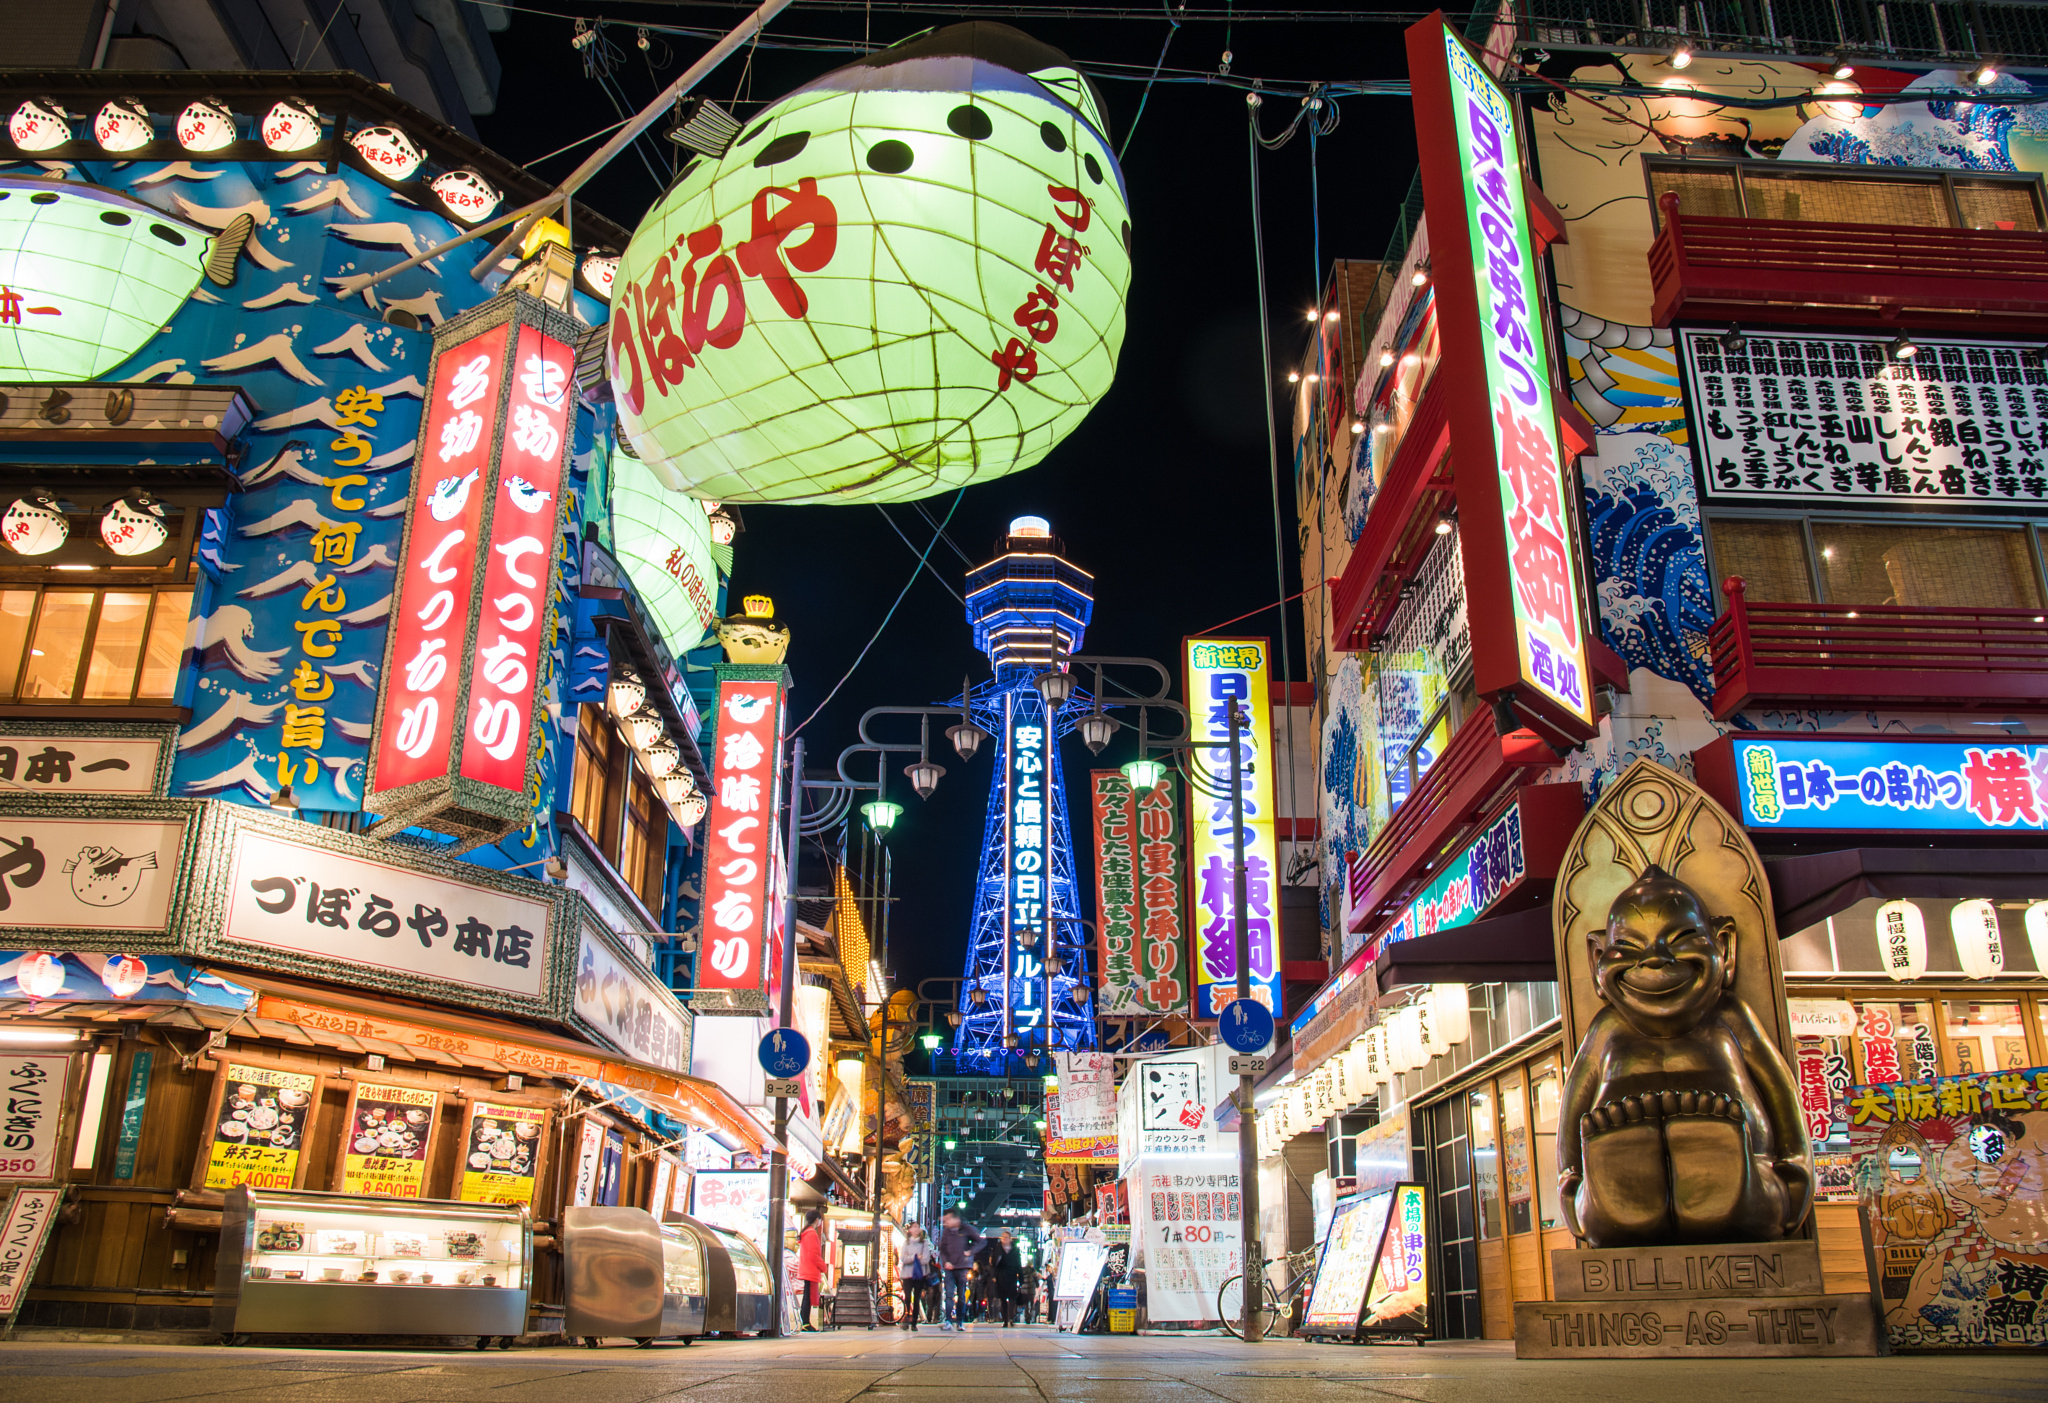 Osaka, Japan - February 10, 2016: The greatest beautiful and popular view point of Tsutenkaku Tower can landmark in osaka japan . area of many delicious japanese restuarants